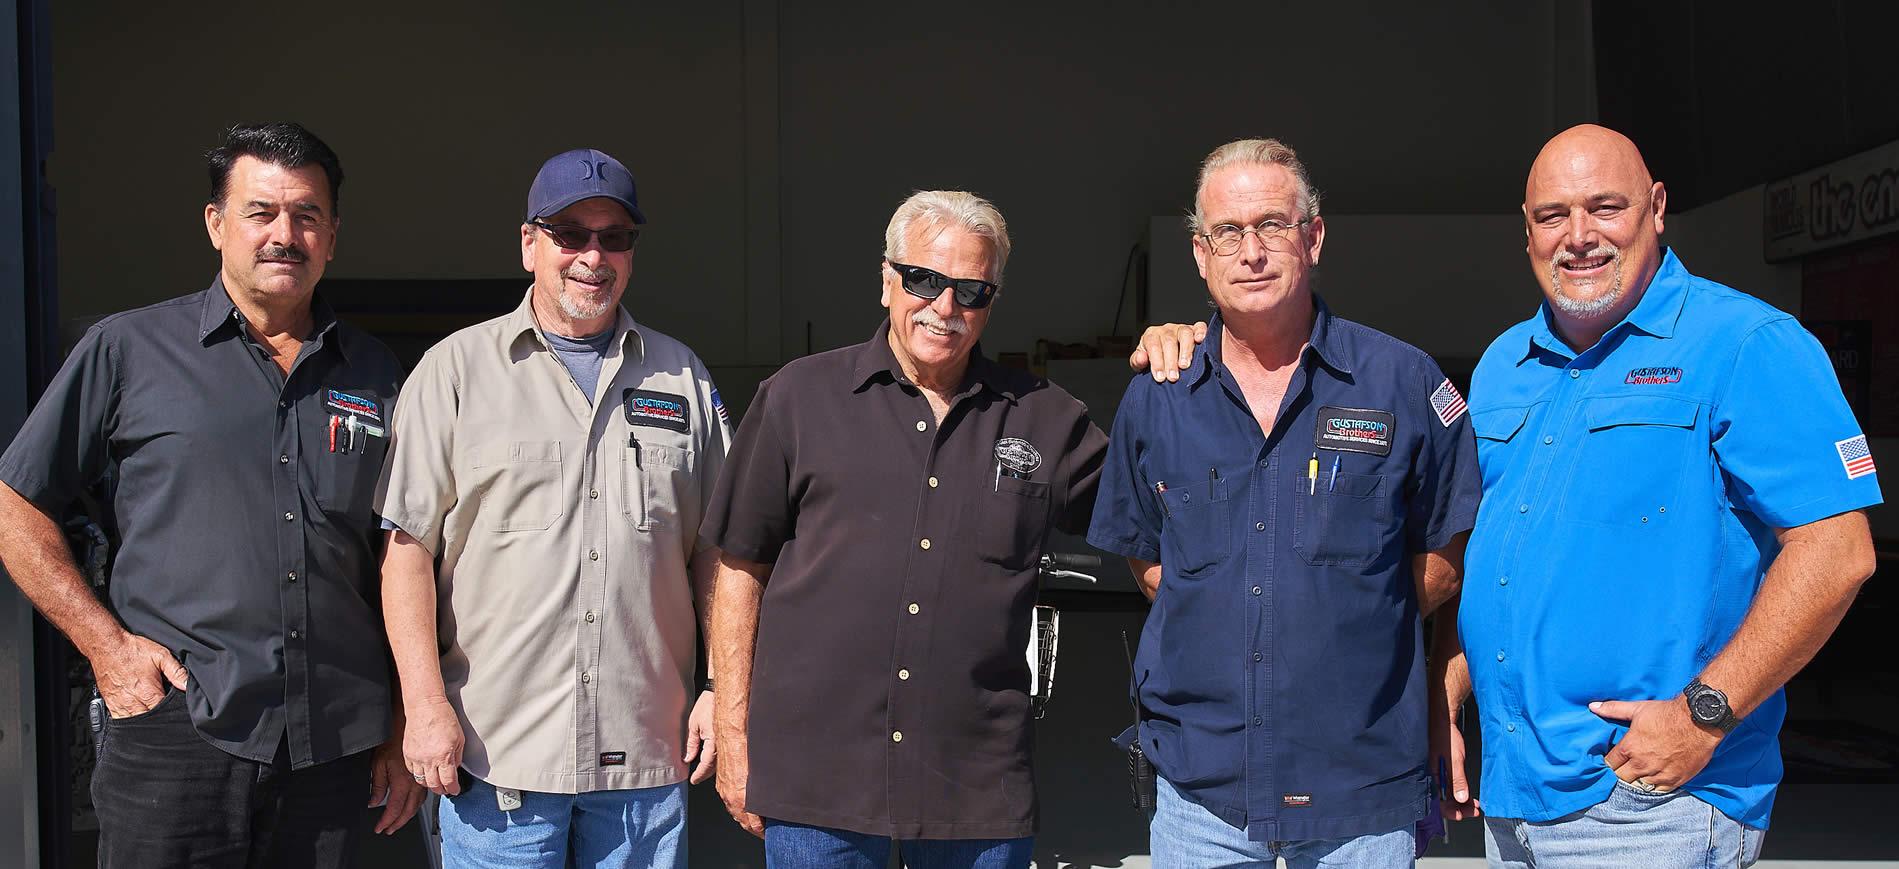 huntington beach auto mechanics @ gustafson bros auto repair shop